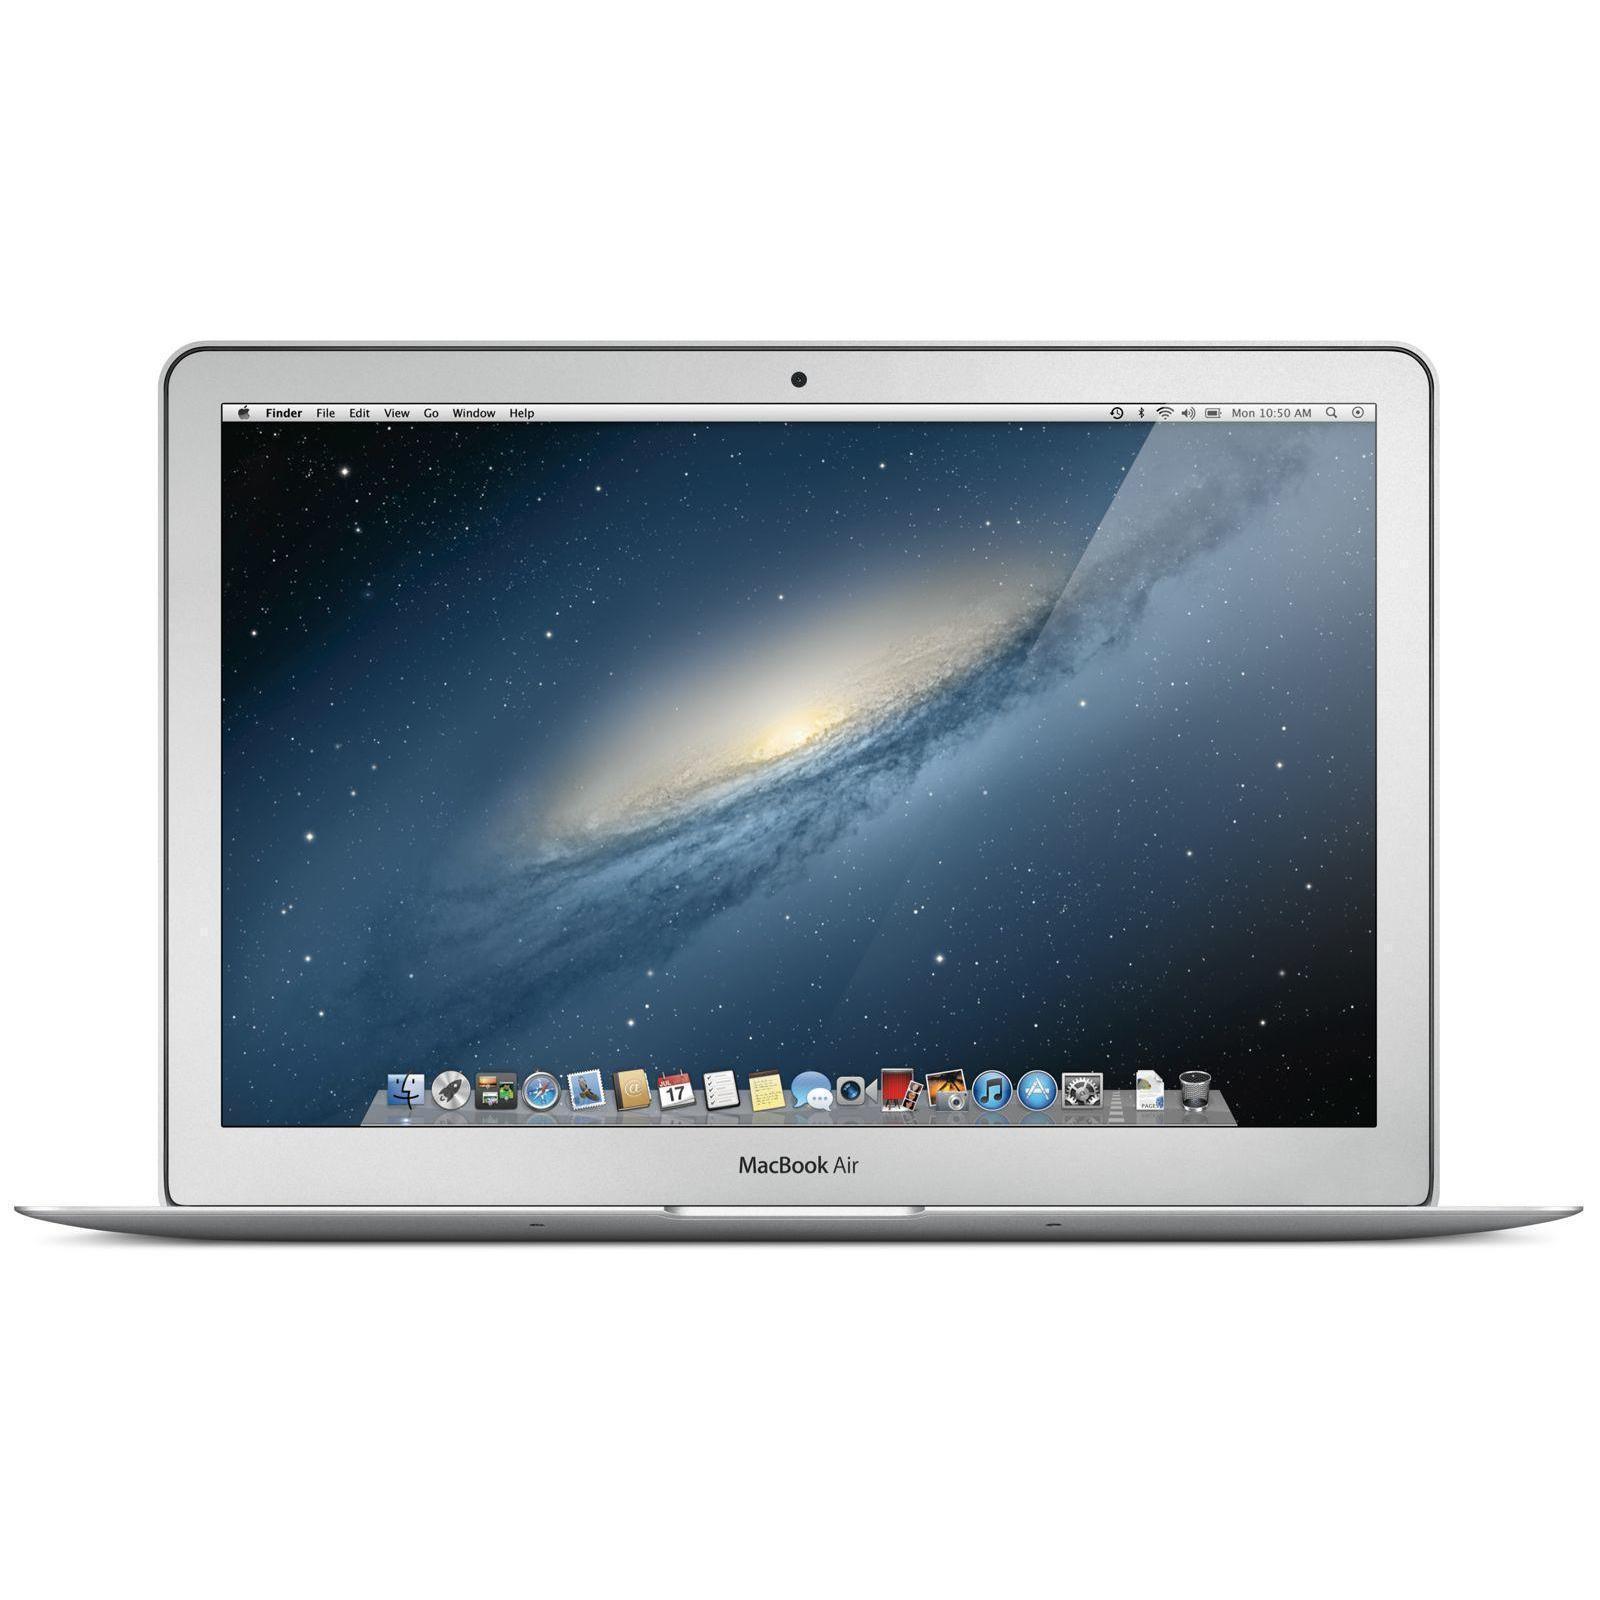 macbook air 13 core i5 2 ghz ssd 128 go ram 8 go azerty. Black Bedroom Furniture Sets. Home Design Ideas